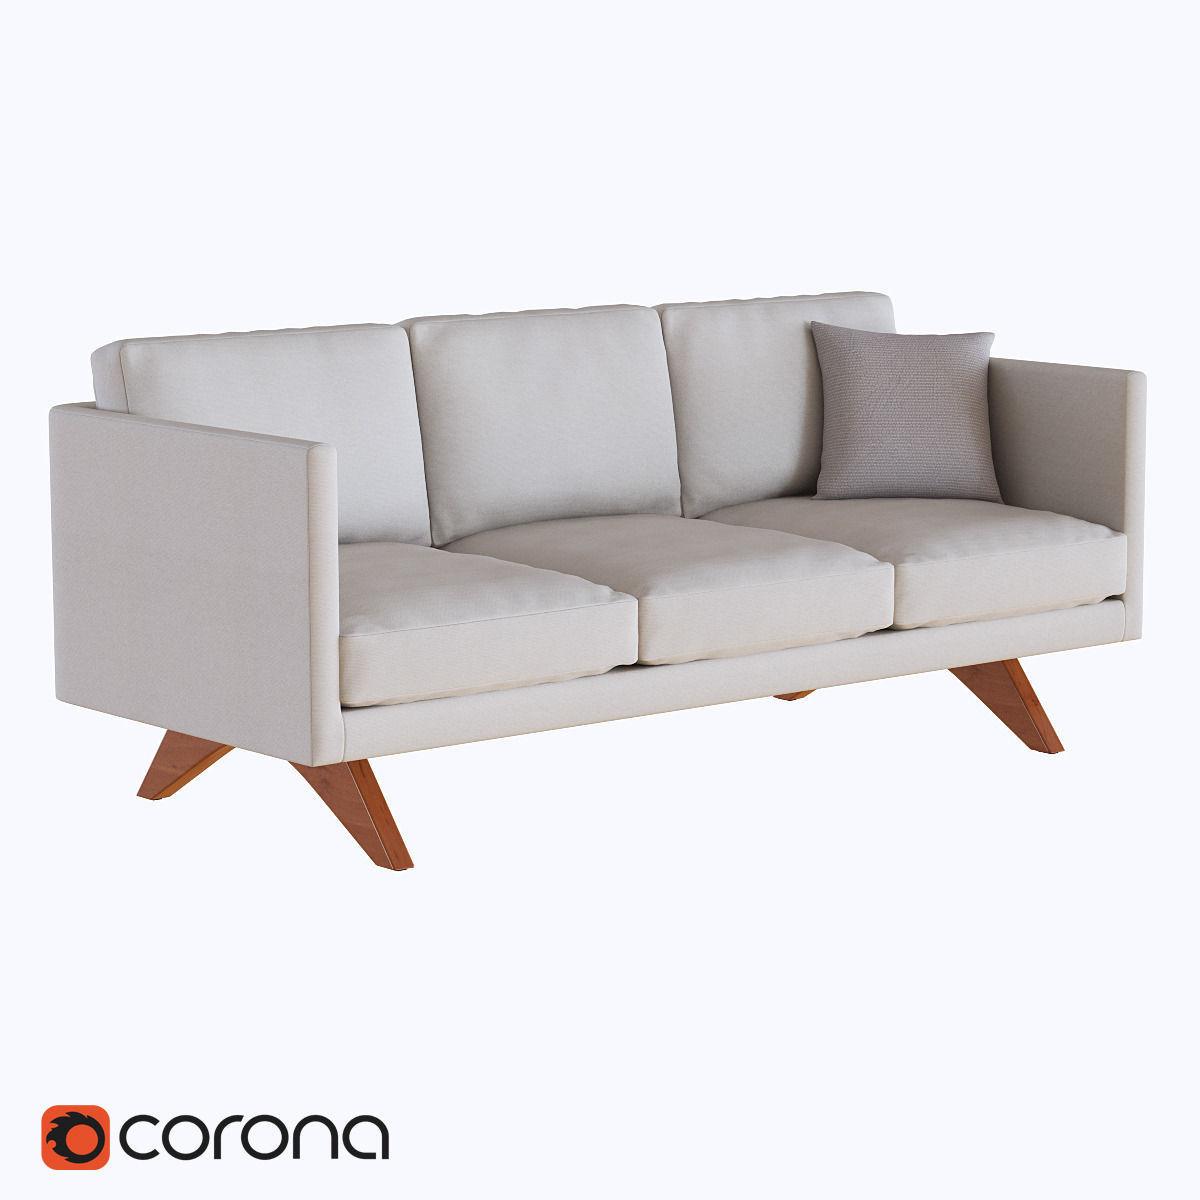 West Elm Brooklyn Upholstered Sofa Model Max Fbx 1